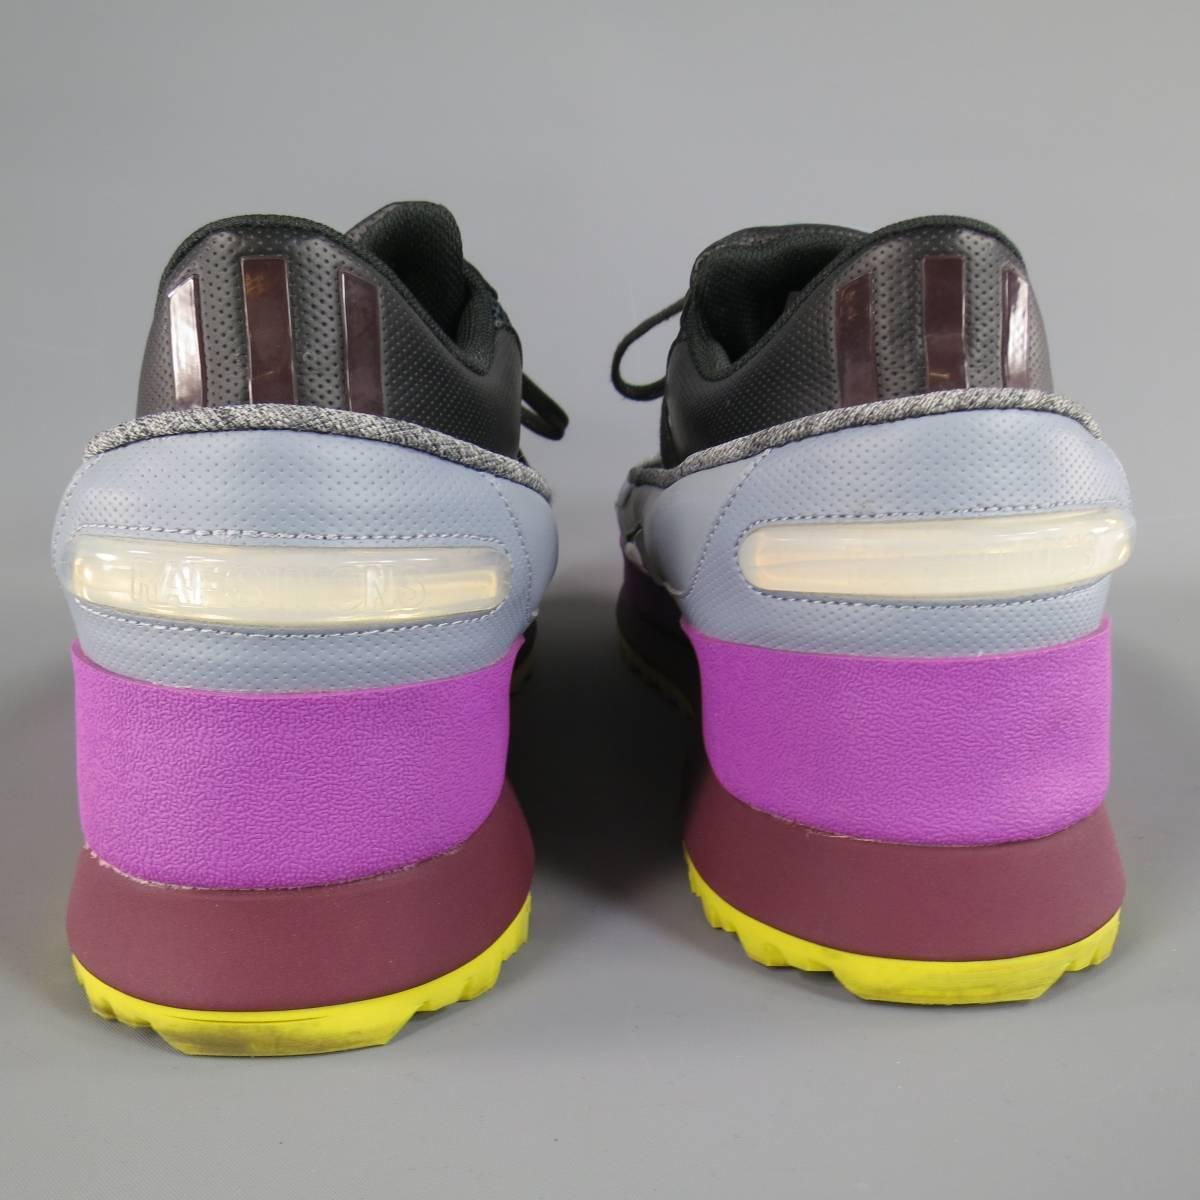 Raf Simons X Adidas Size 11 Black Gray Purple And Yellow